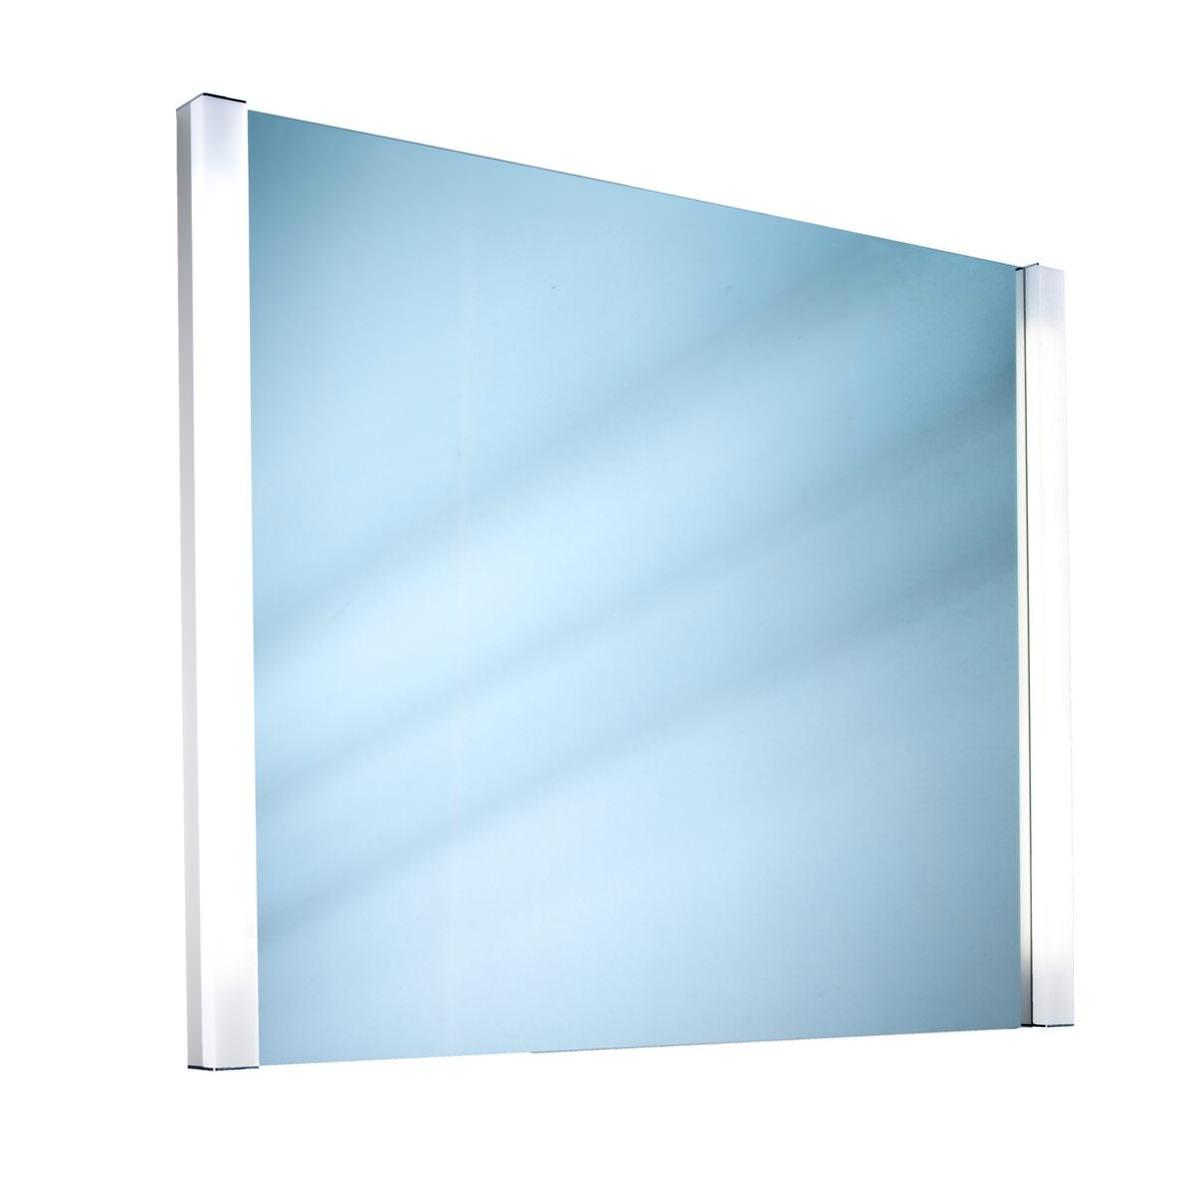 Schneider classicline illuminated mirror 1100mm for Illuminated mirrors